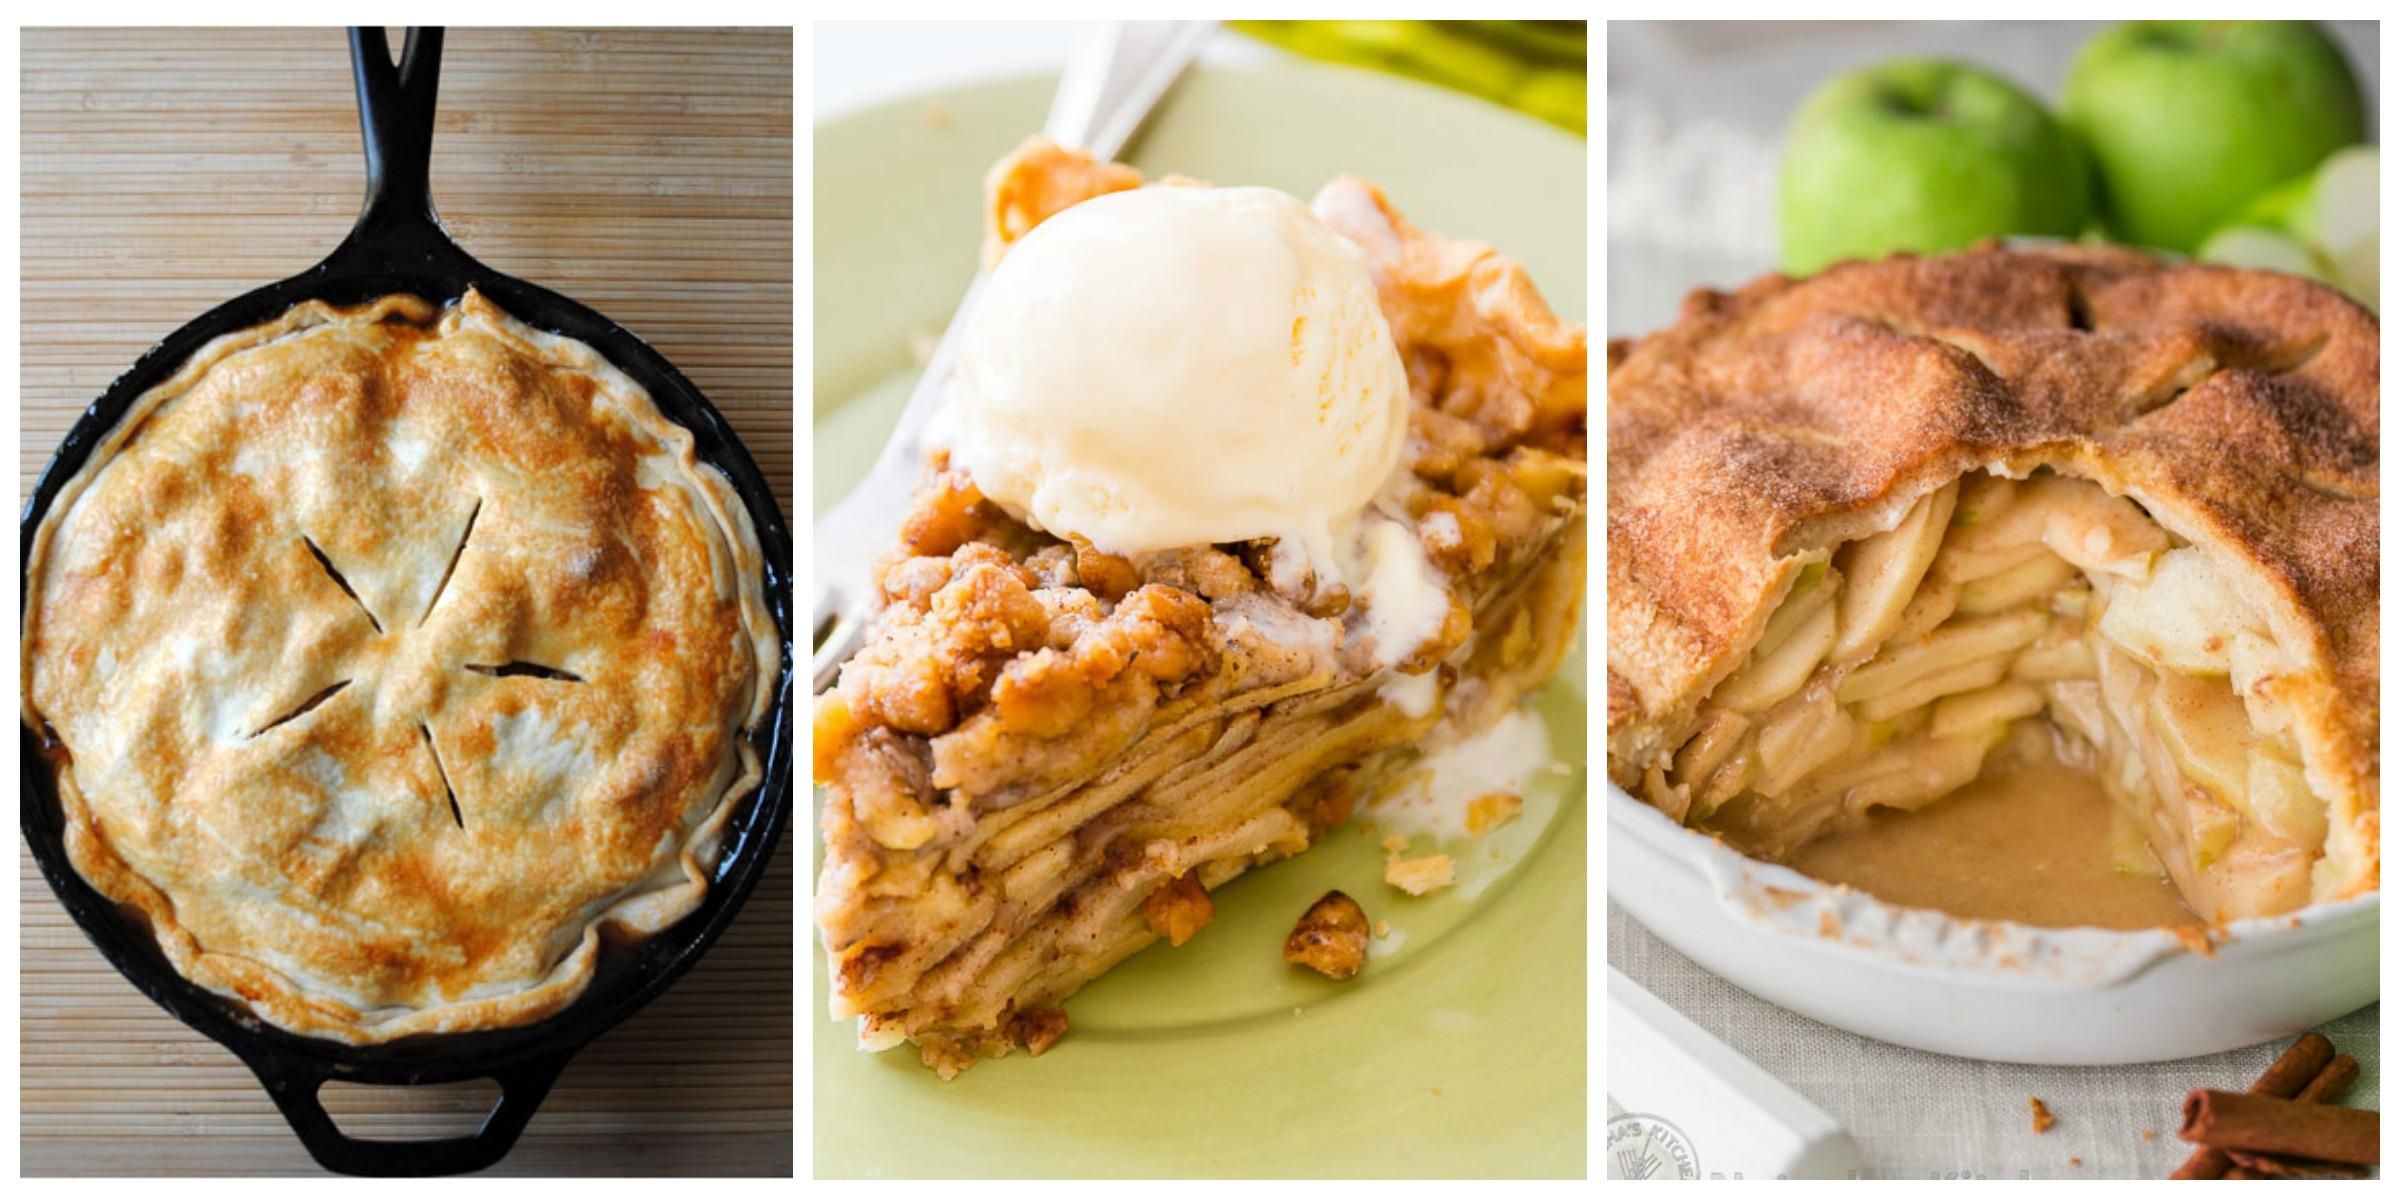 35 Best Apple Pie Recipes How To Make Homemade Apple Pie